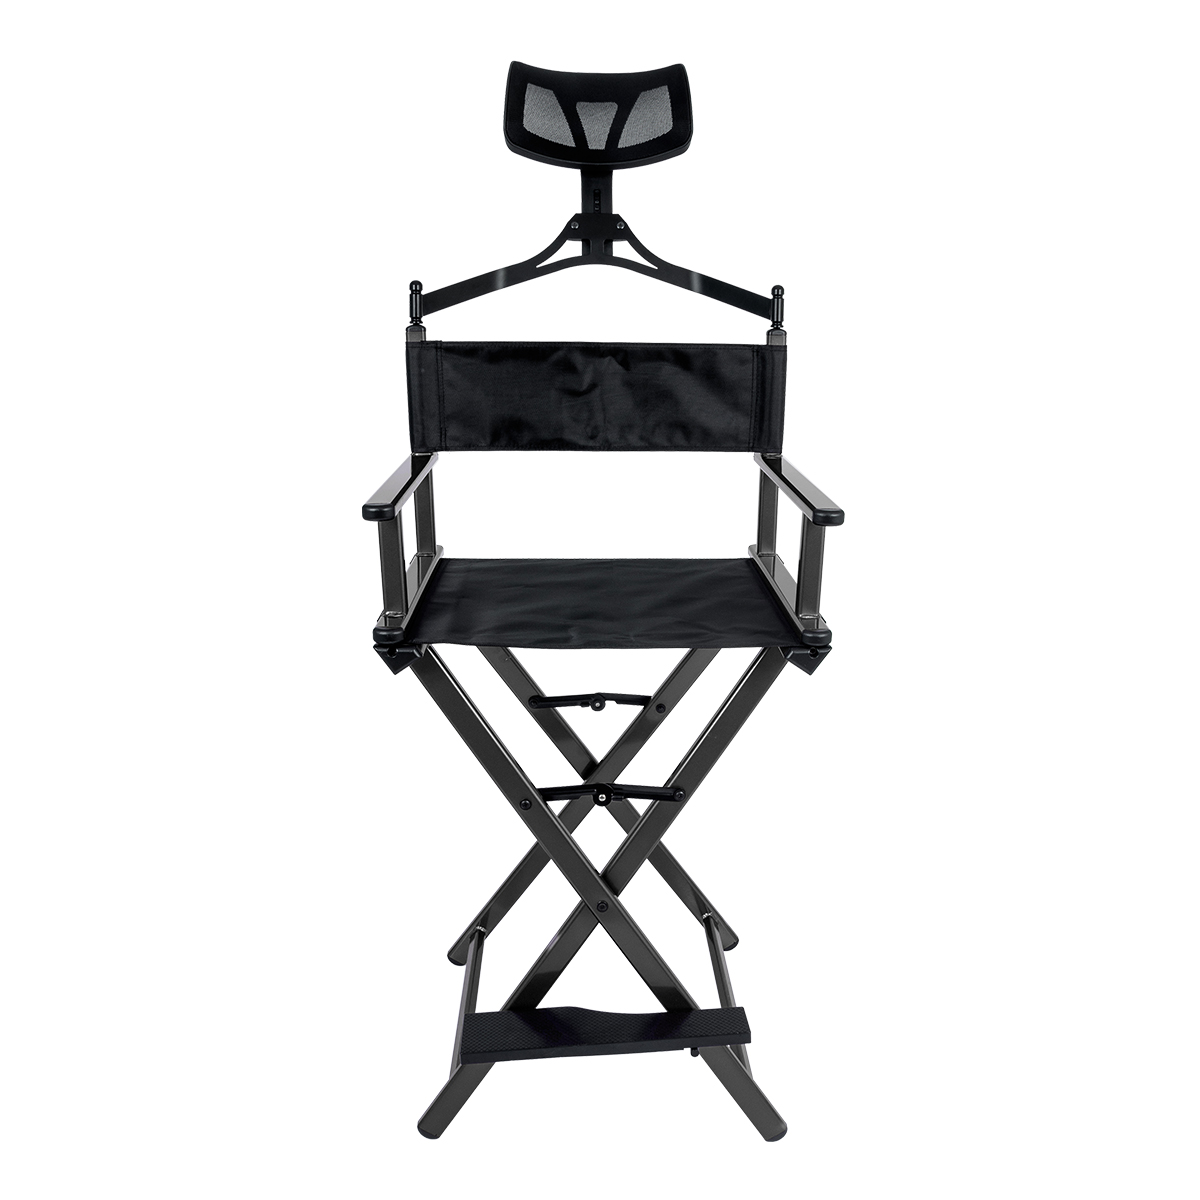 Cadeira Maquiador Diretor Cinema Alumínio Pelegrin PEL-Y002 Preta